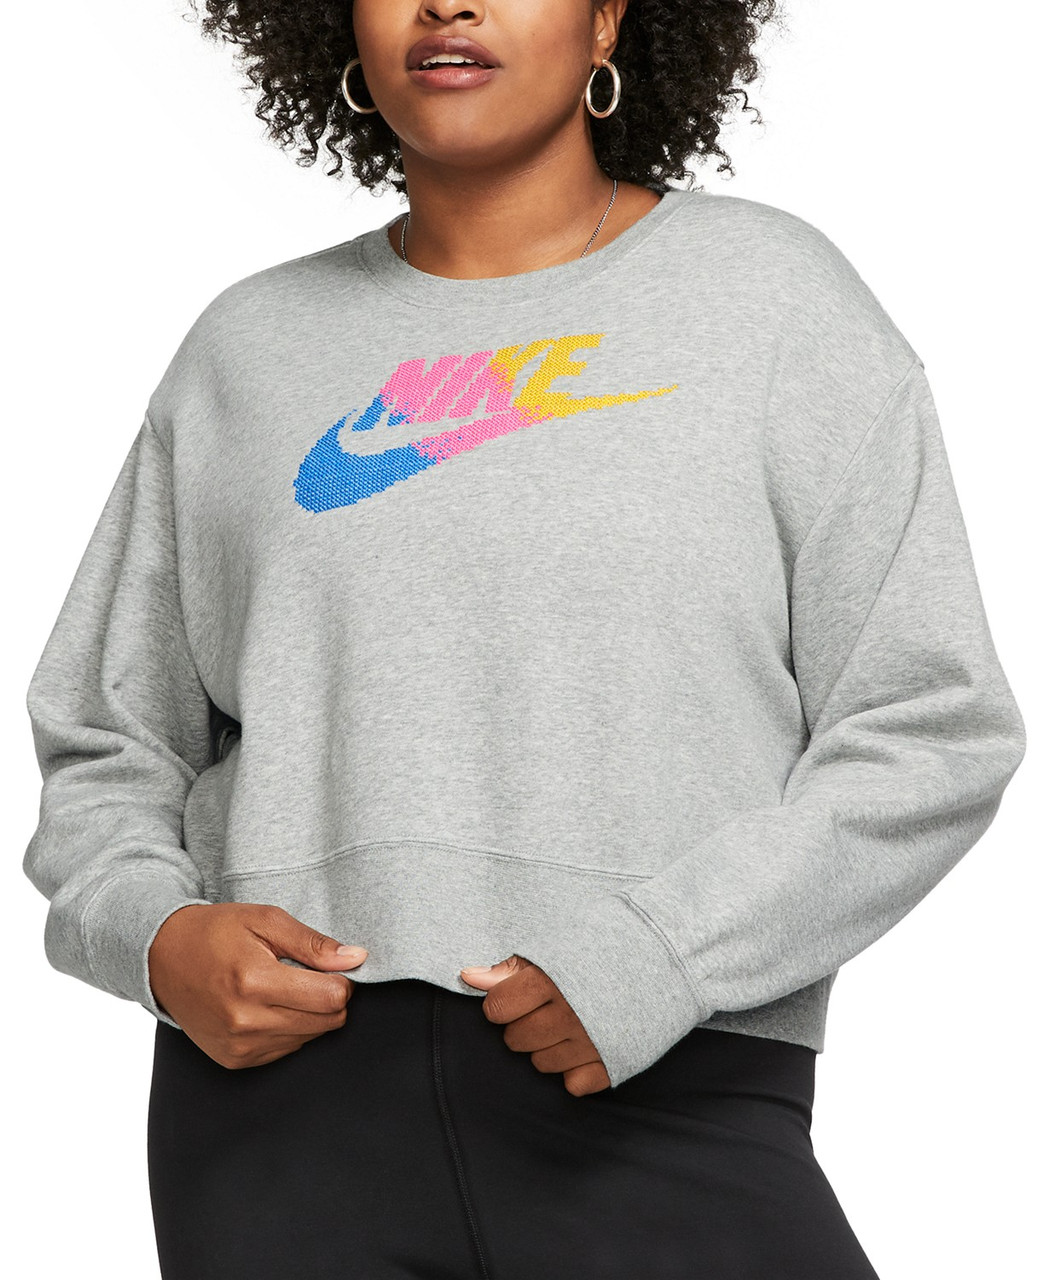 Nike Женский свитшот - Е2